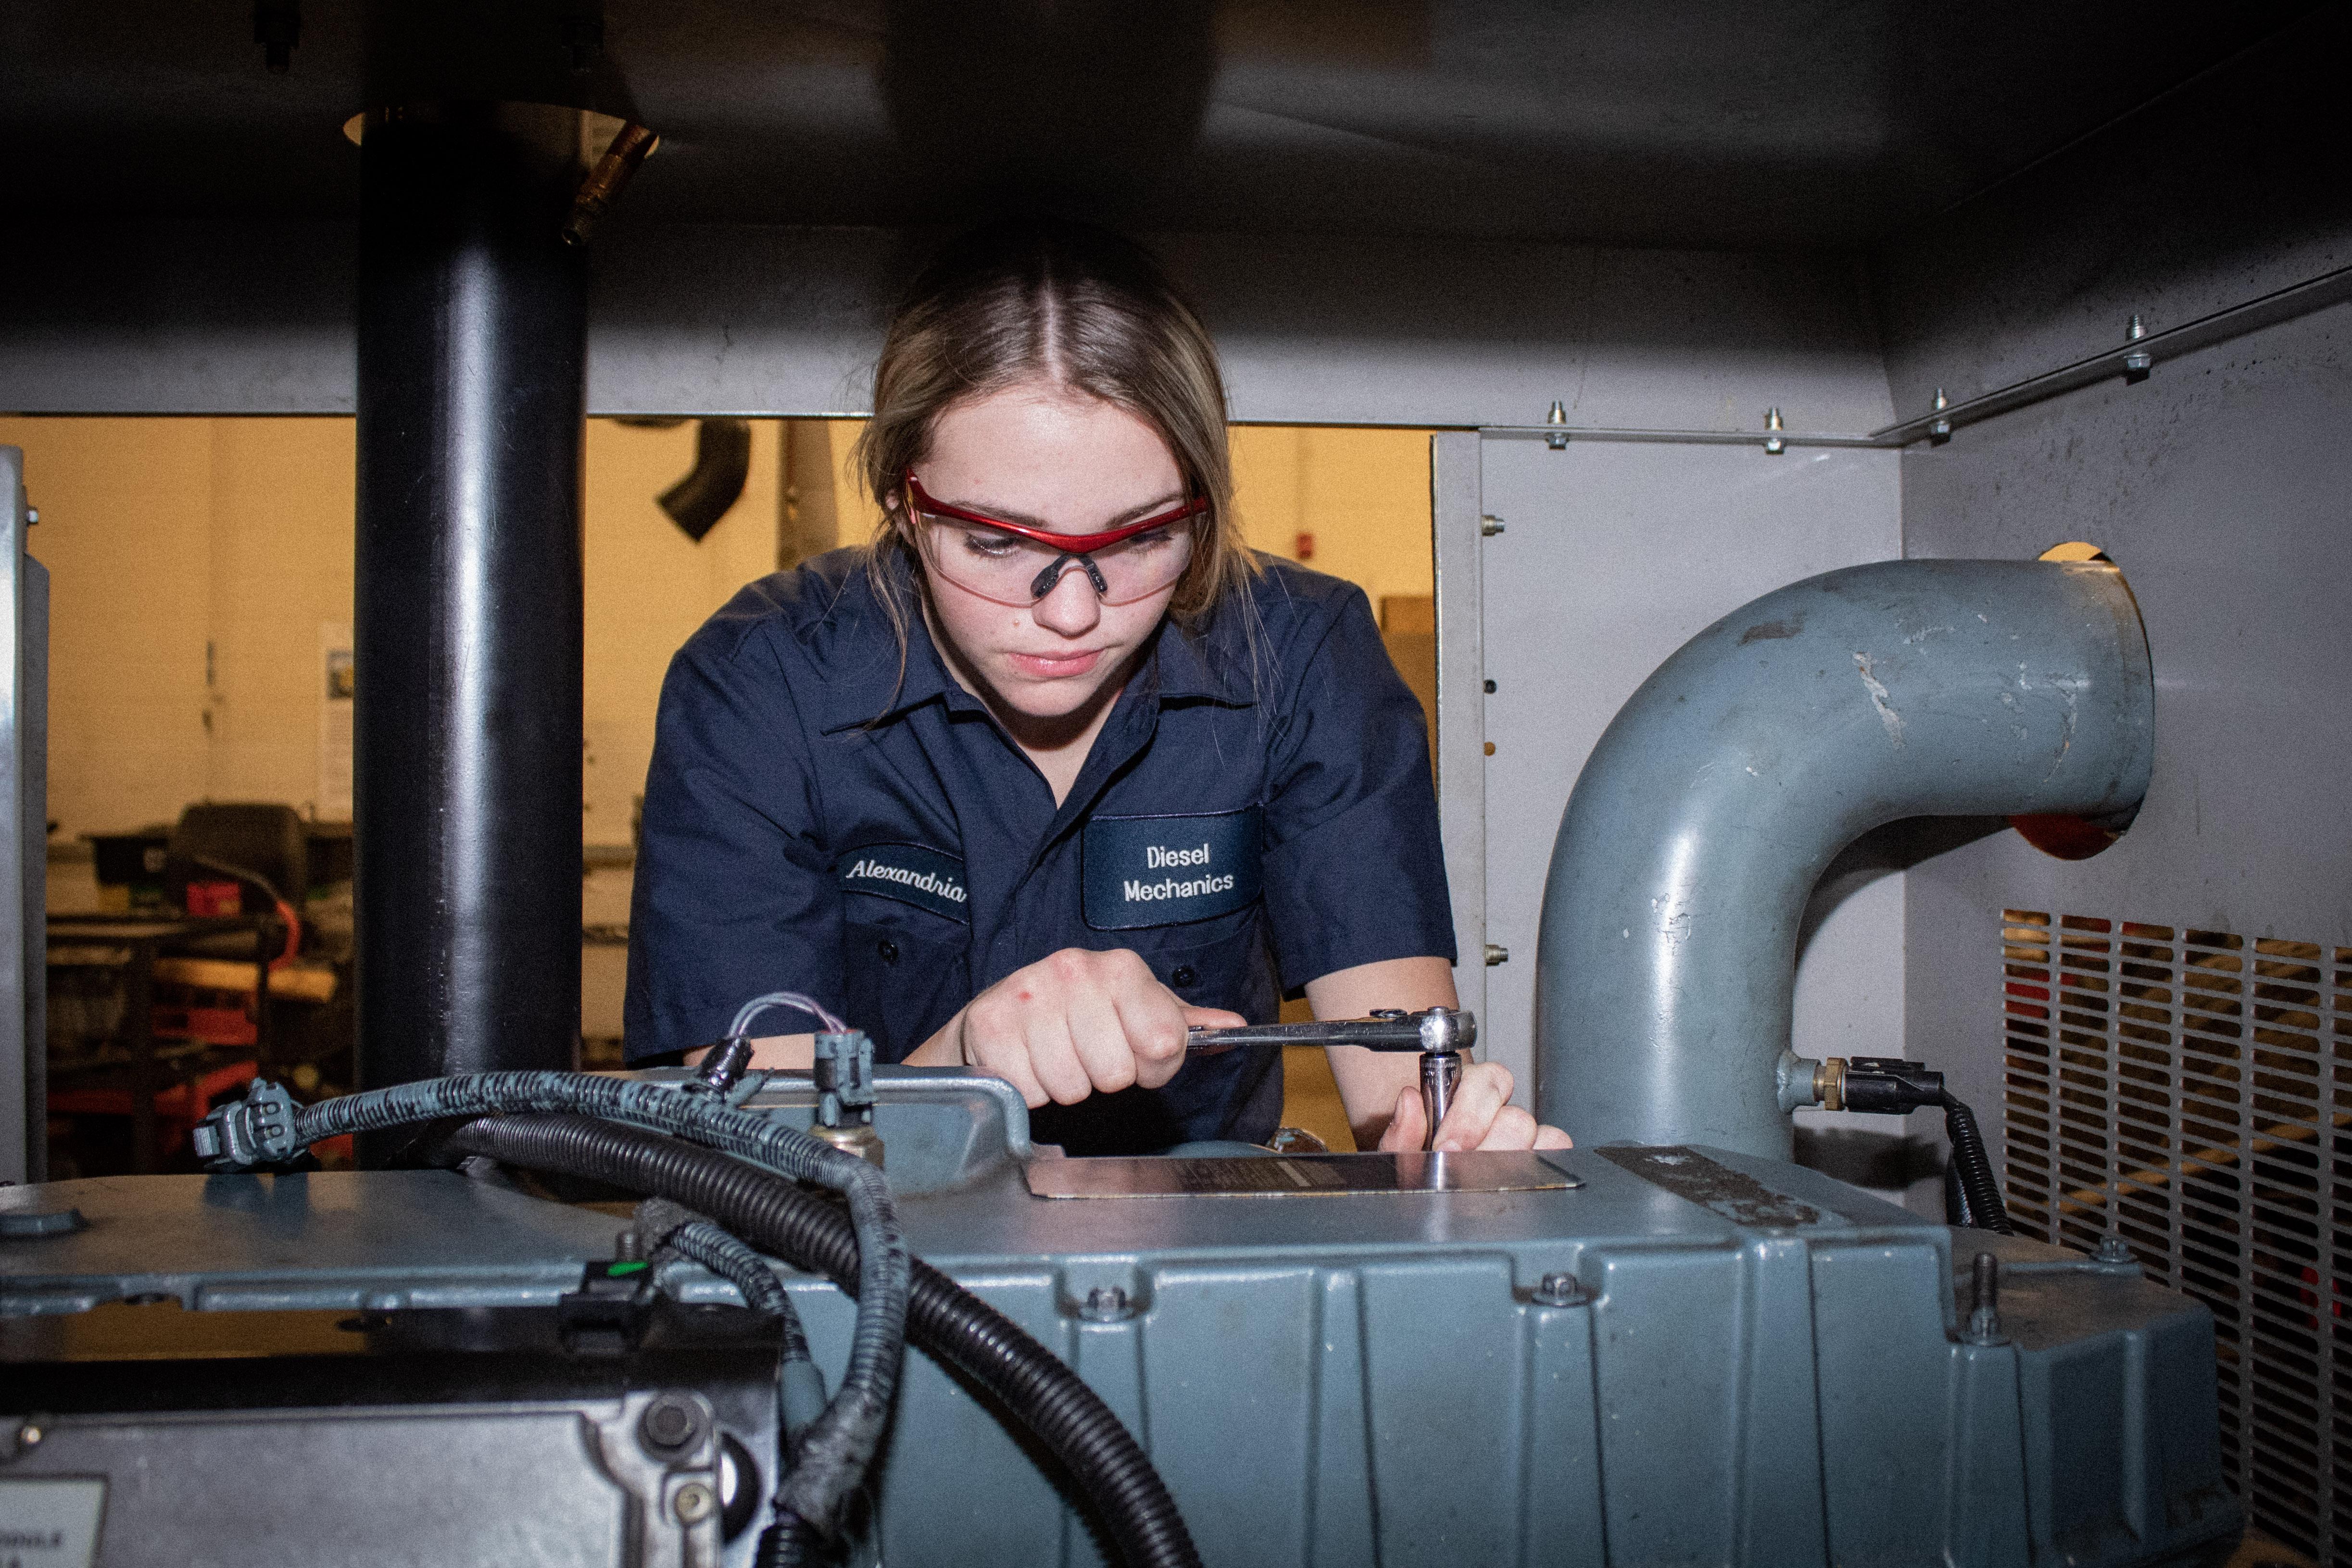 Diesel Technology Student